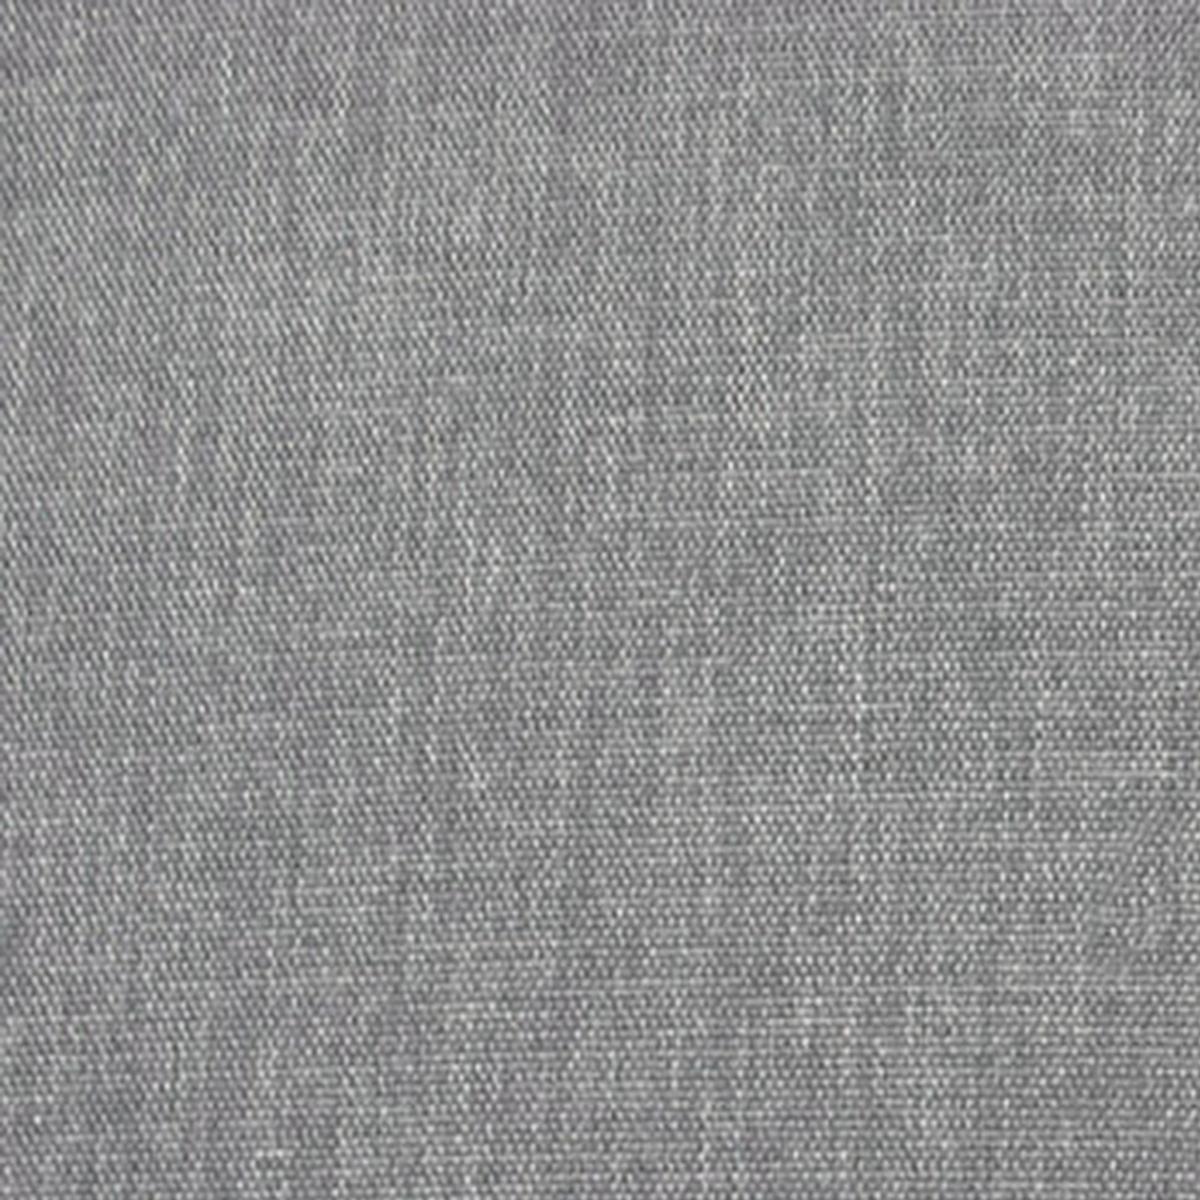 Fabric 8 - Linen Grey